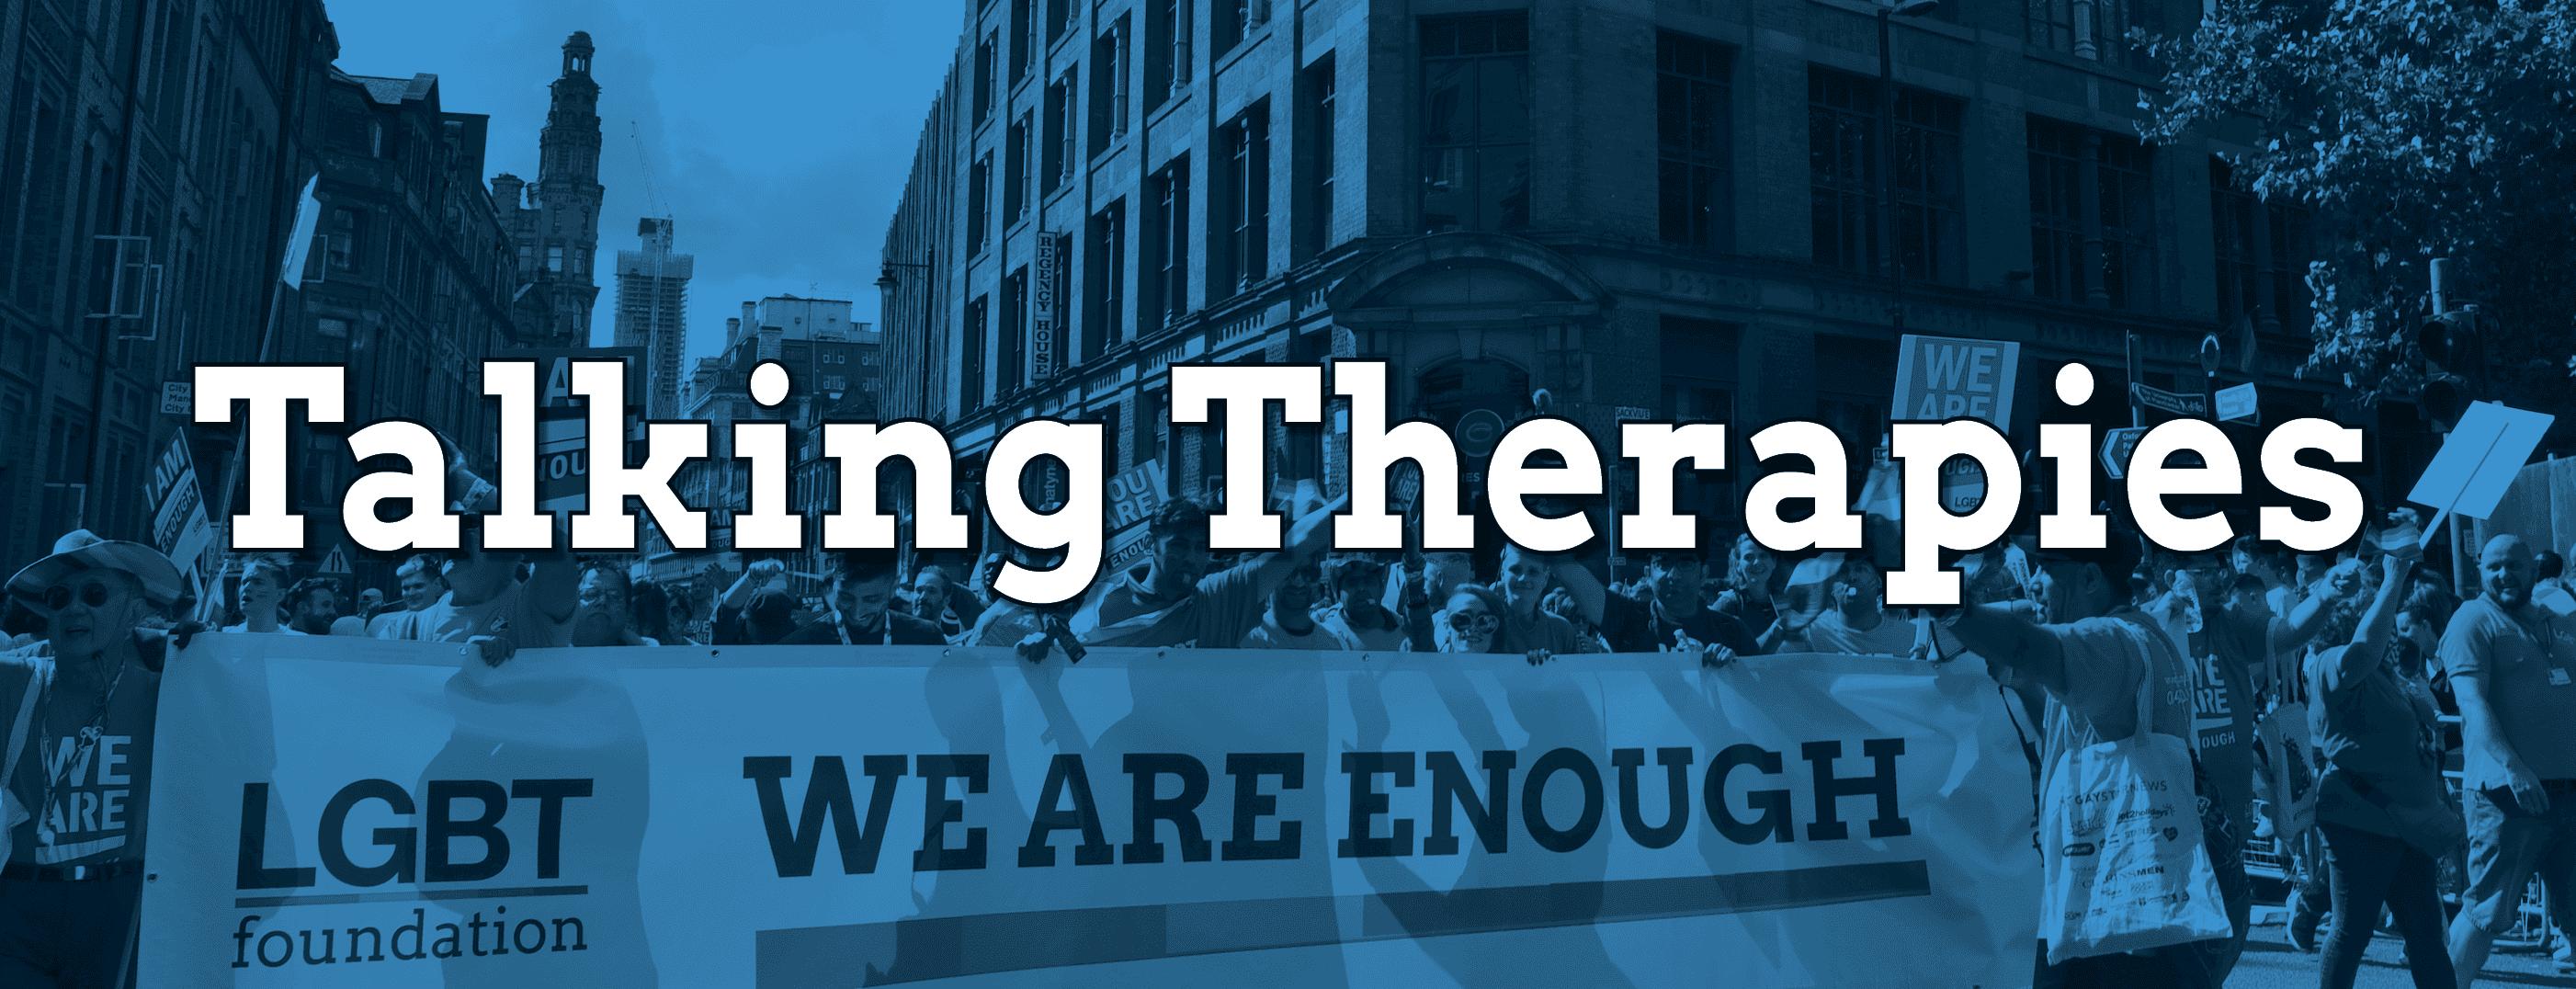 Talking Therapies